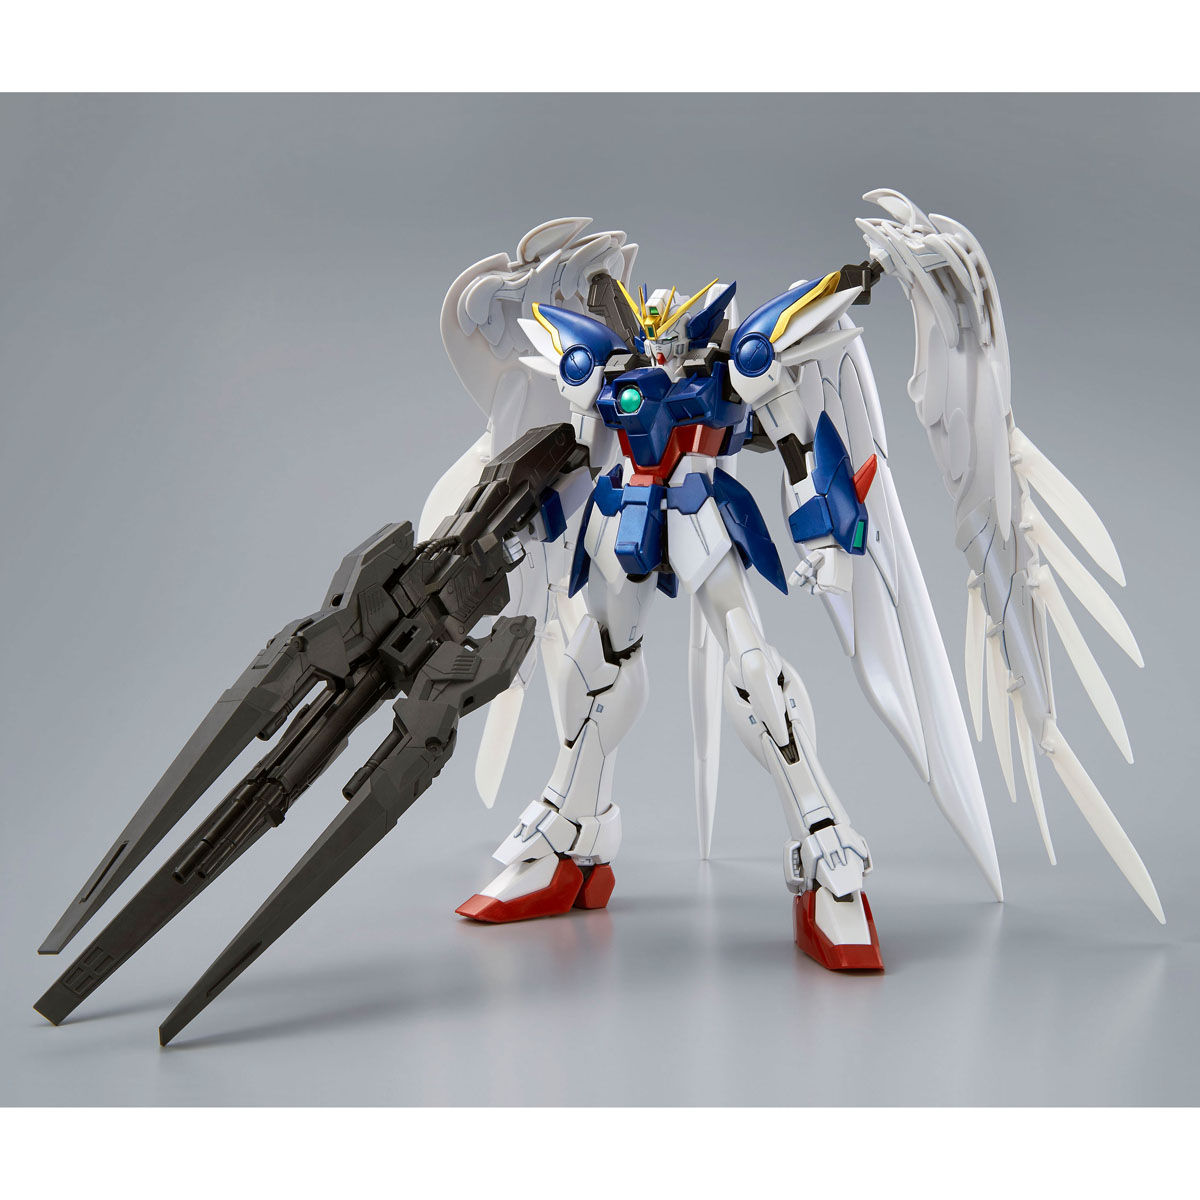 "59010MG 1/100 XXXG-00W0 ウイングガンダムゼロ EW & ドライツバーク [スペシャルコーティング] [Wing Gundam Zero EW & Drei Zwerg ""Special Coating""]"